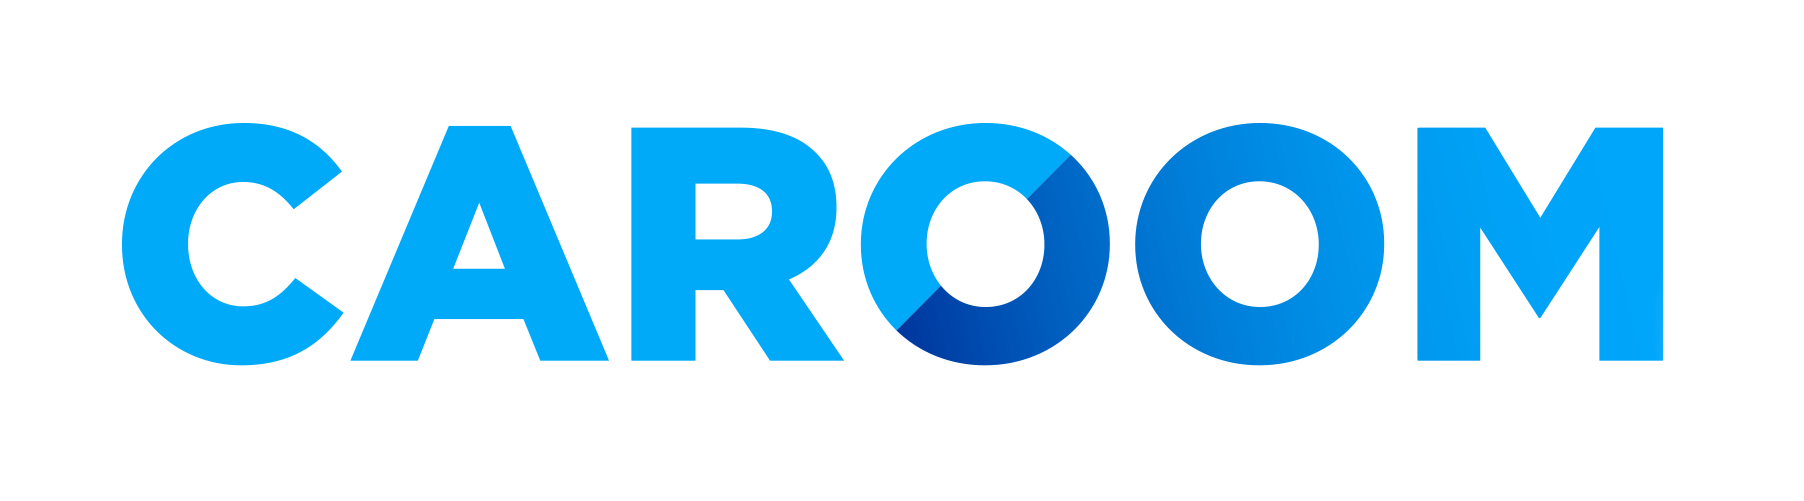 logo caroom